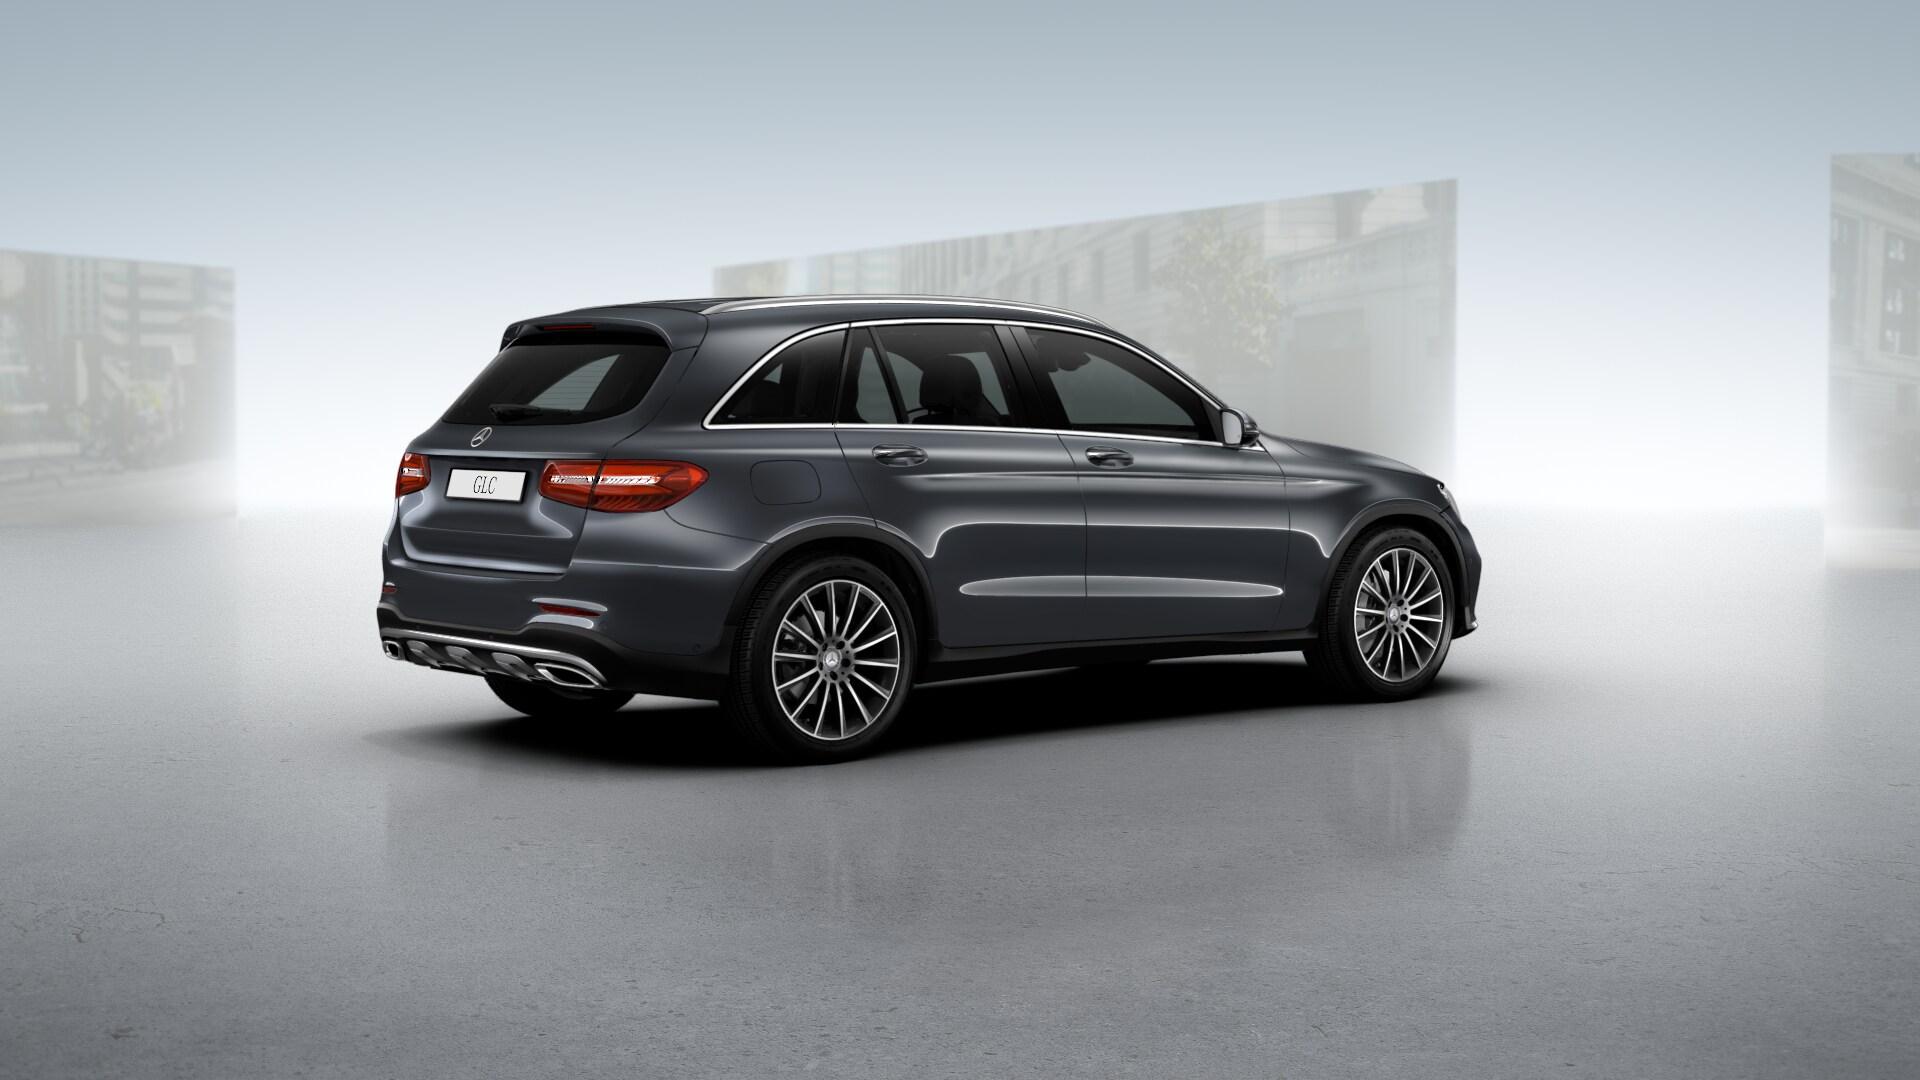 Mercedes Benz Farbe Schwarz Metallic